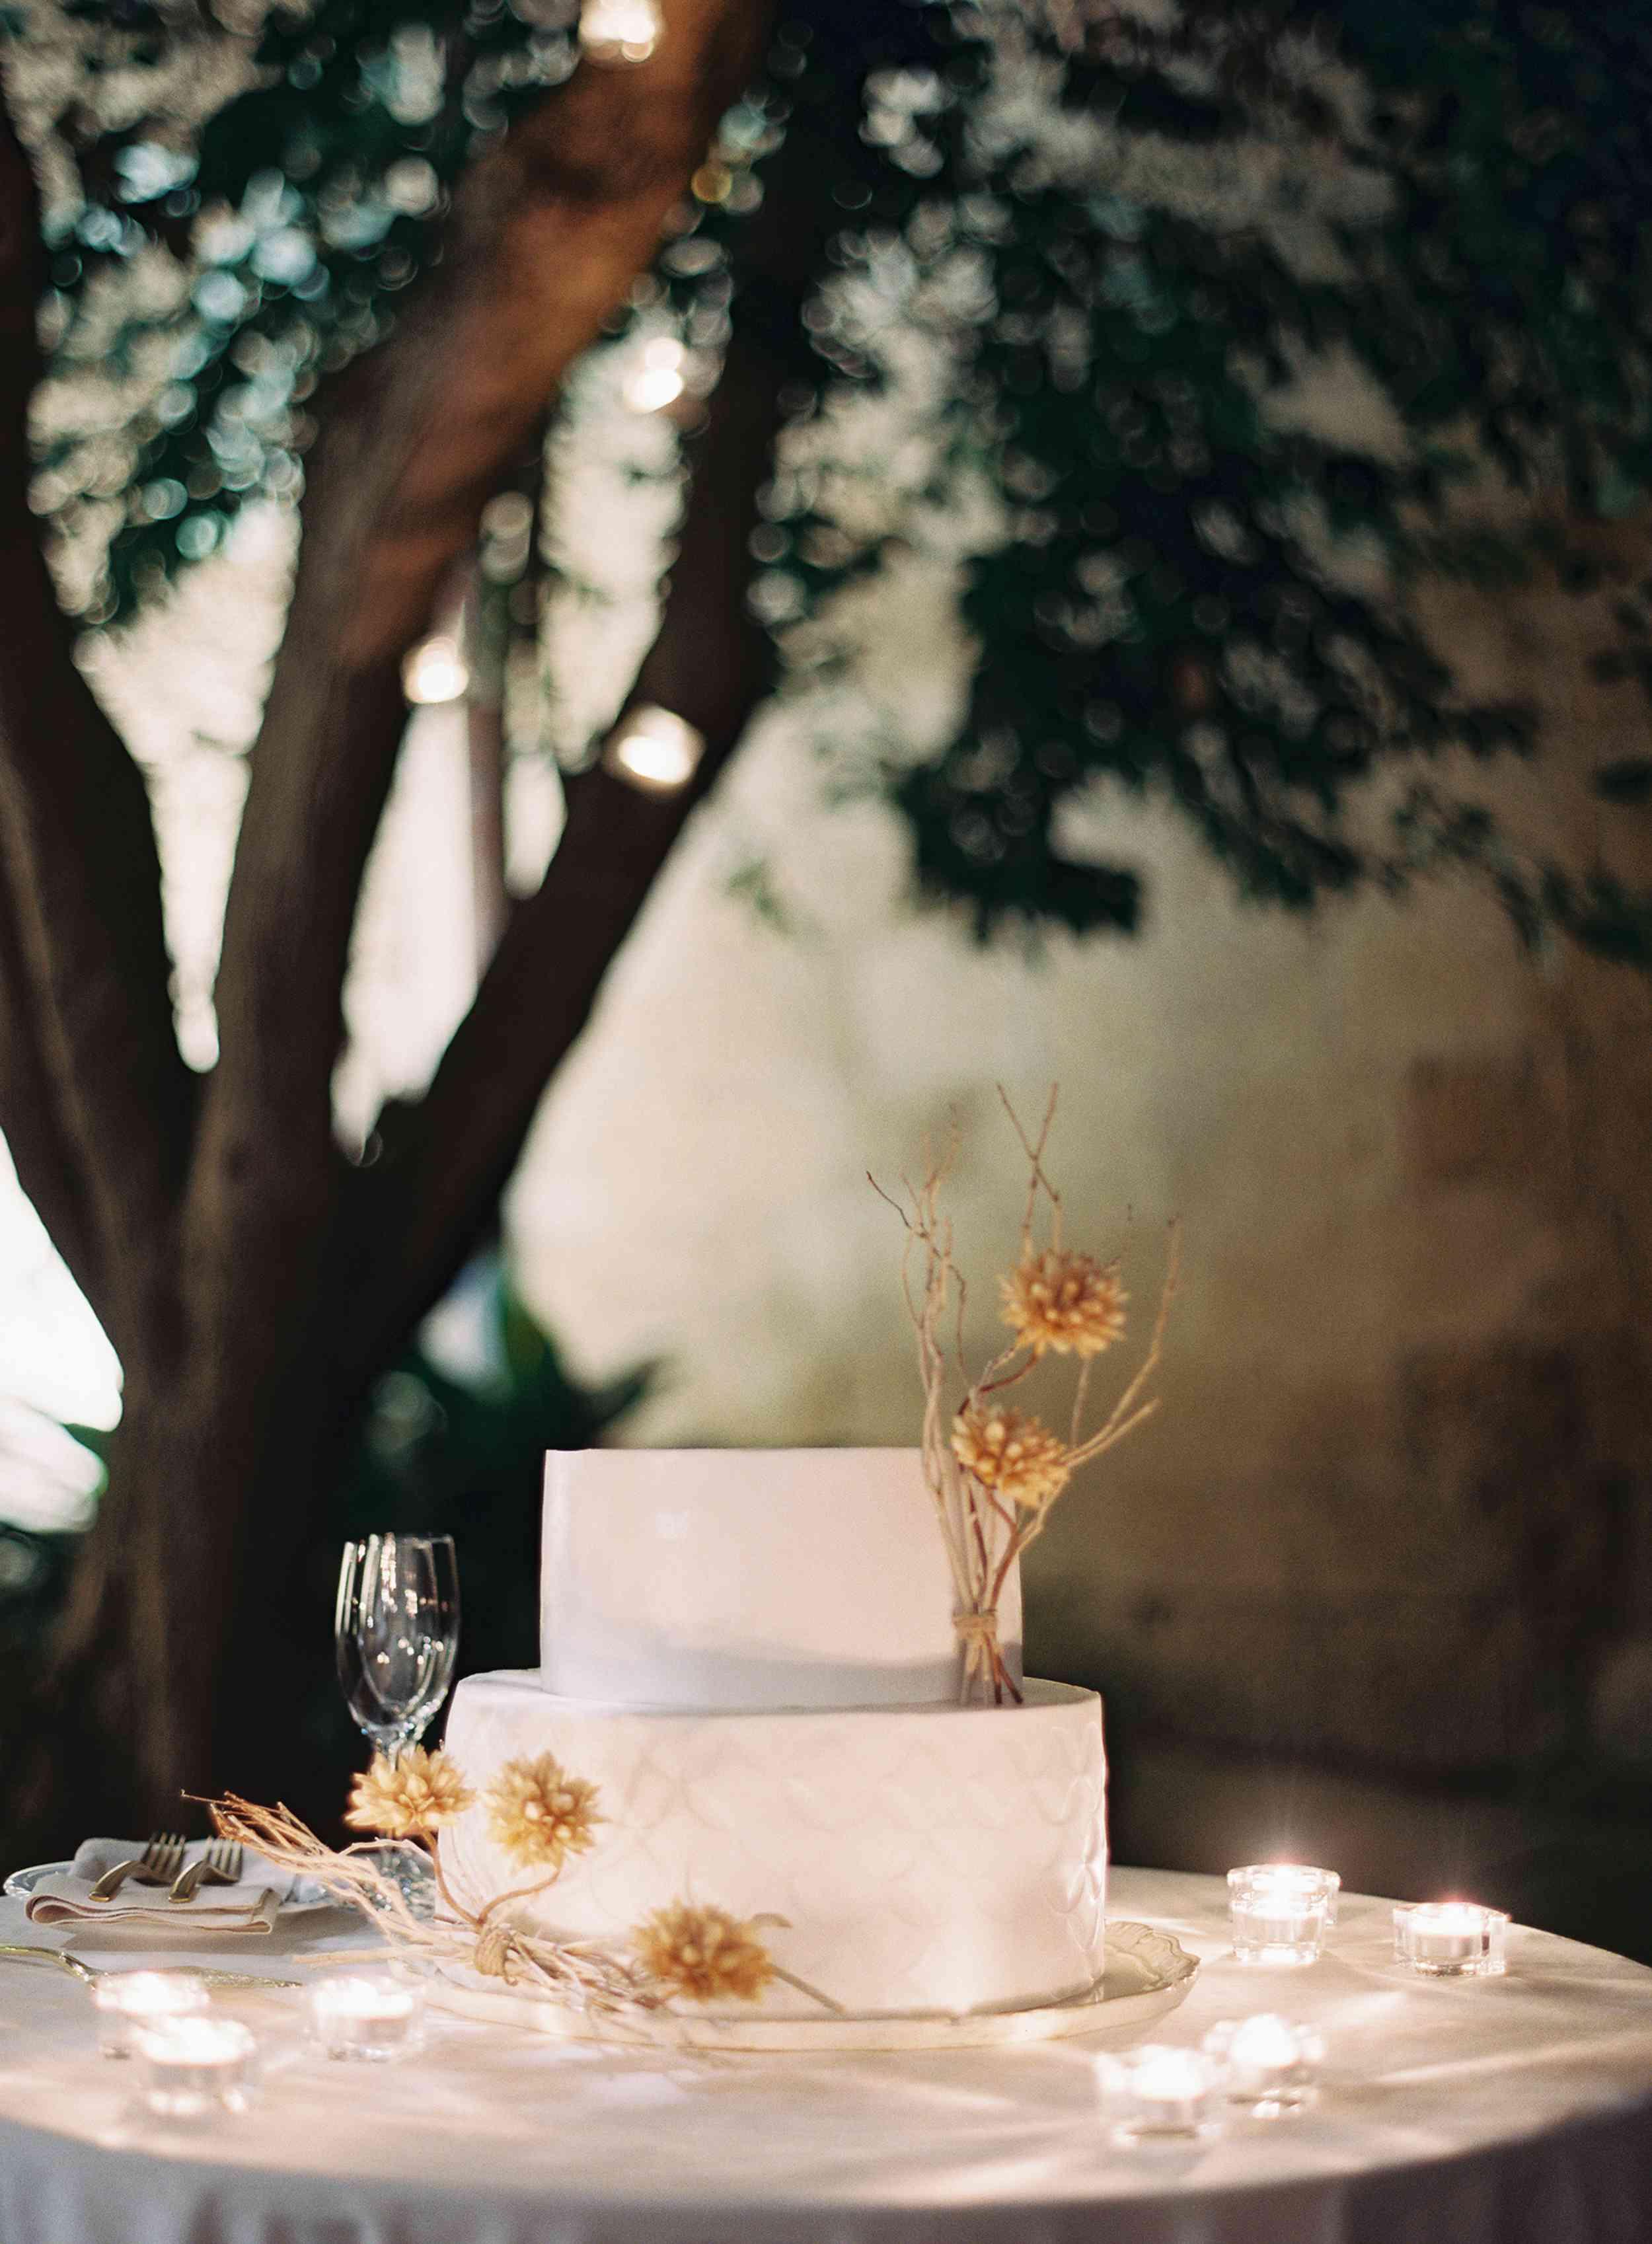 classic la badia italian wedding, modern wedding cake with sugar flowers